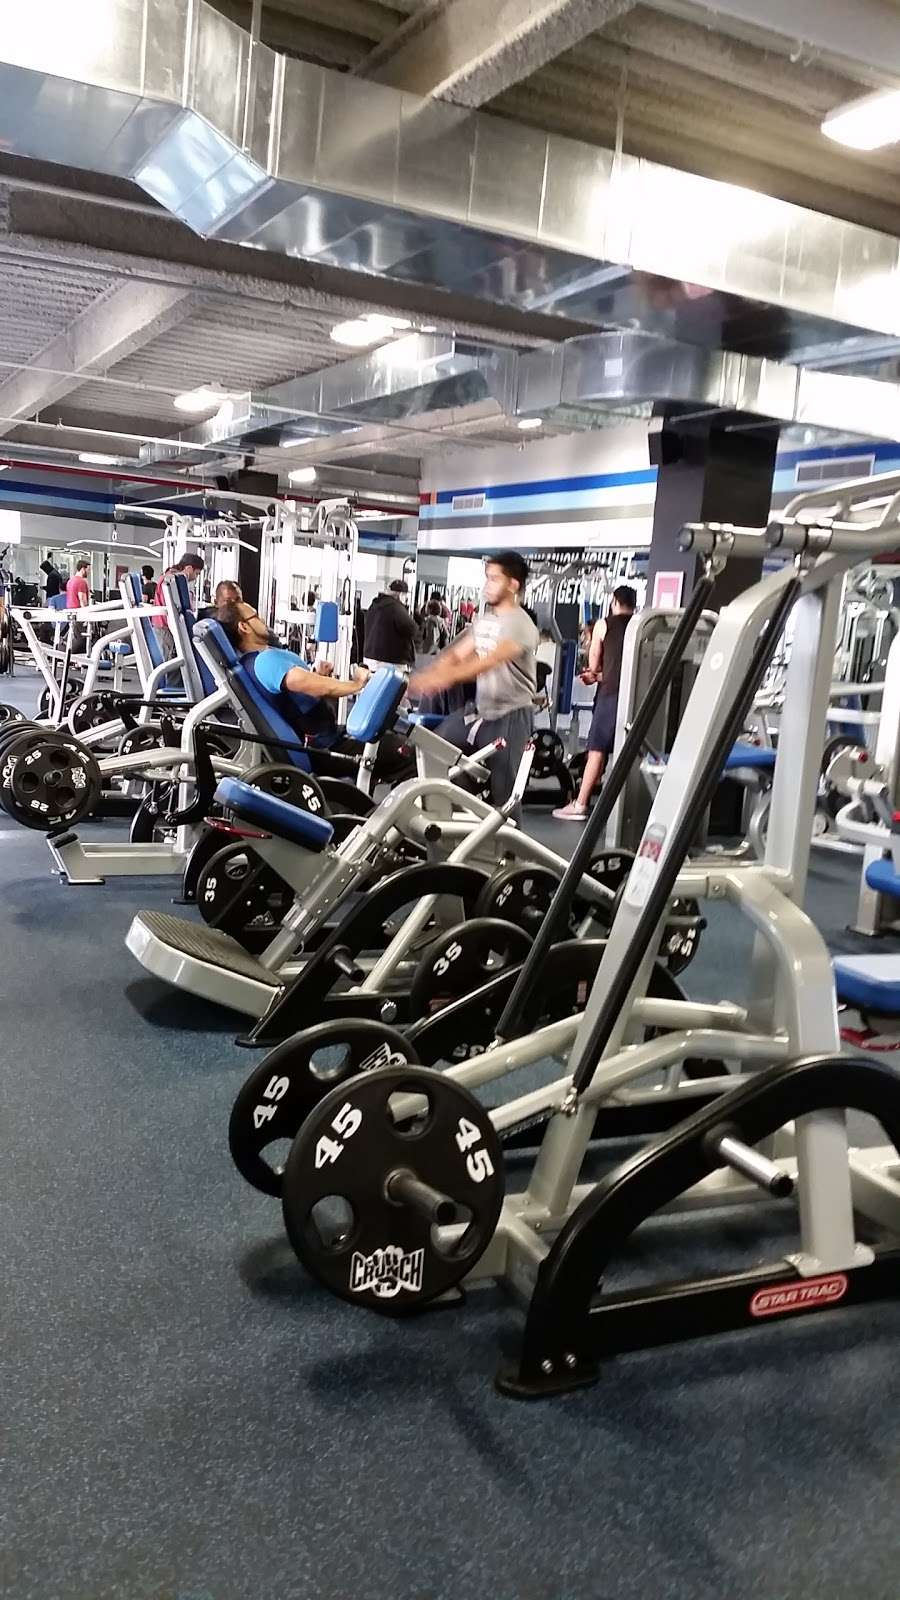 Crunch Fitness Richmond Hill 115 02 Jamaica Ave Richmond Hill Ny 11418 Usa